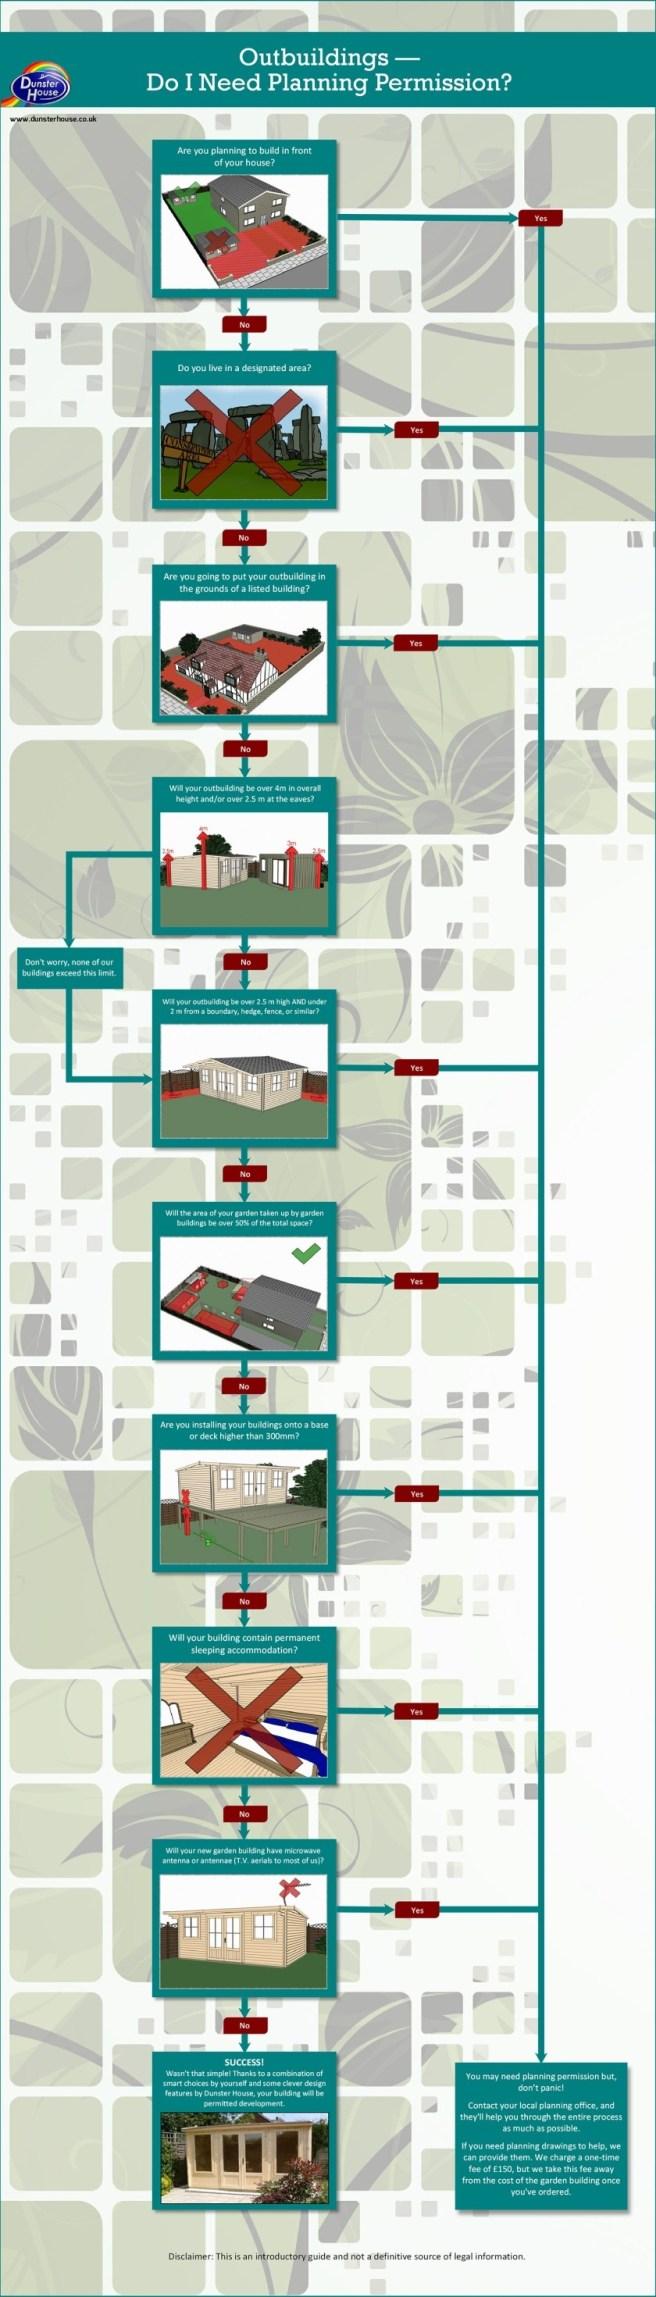 Planning Permission Flowchart